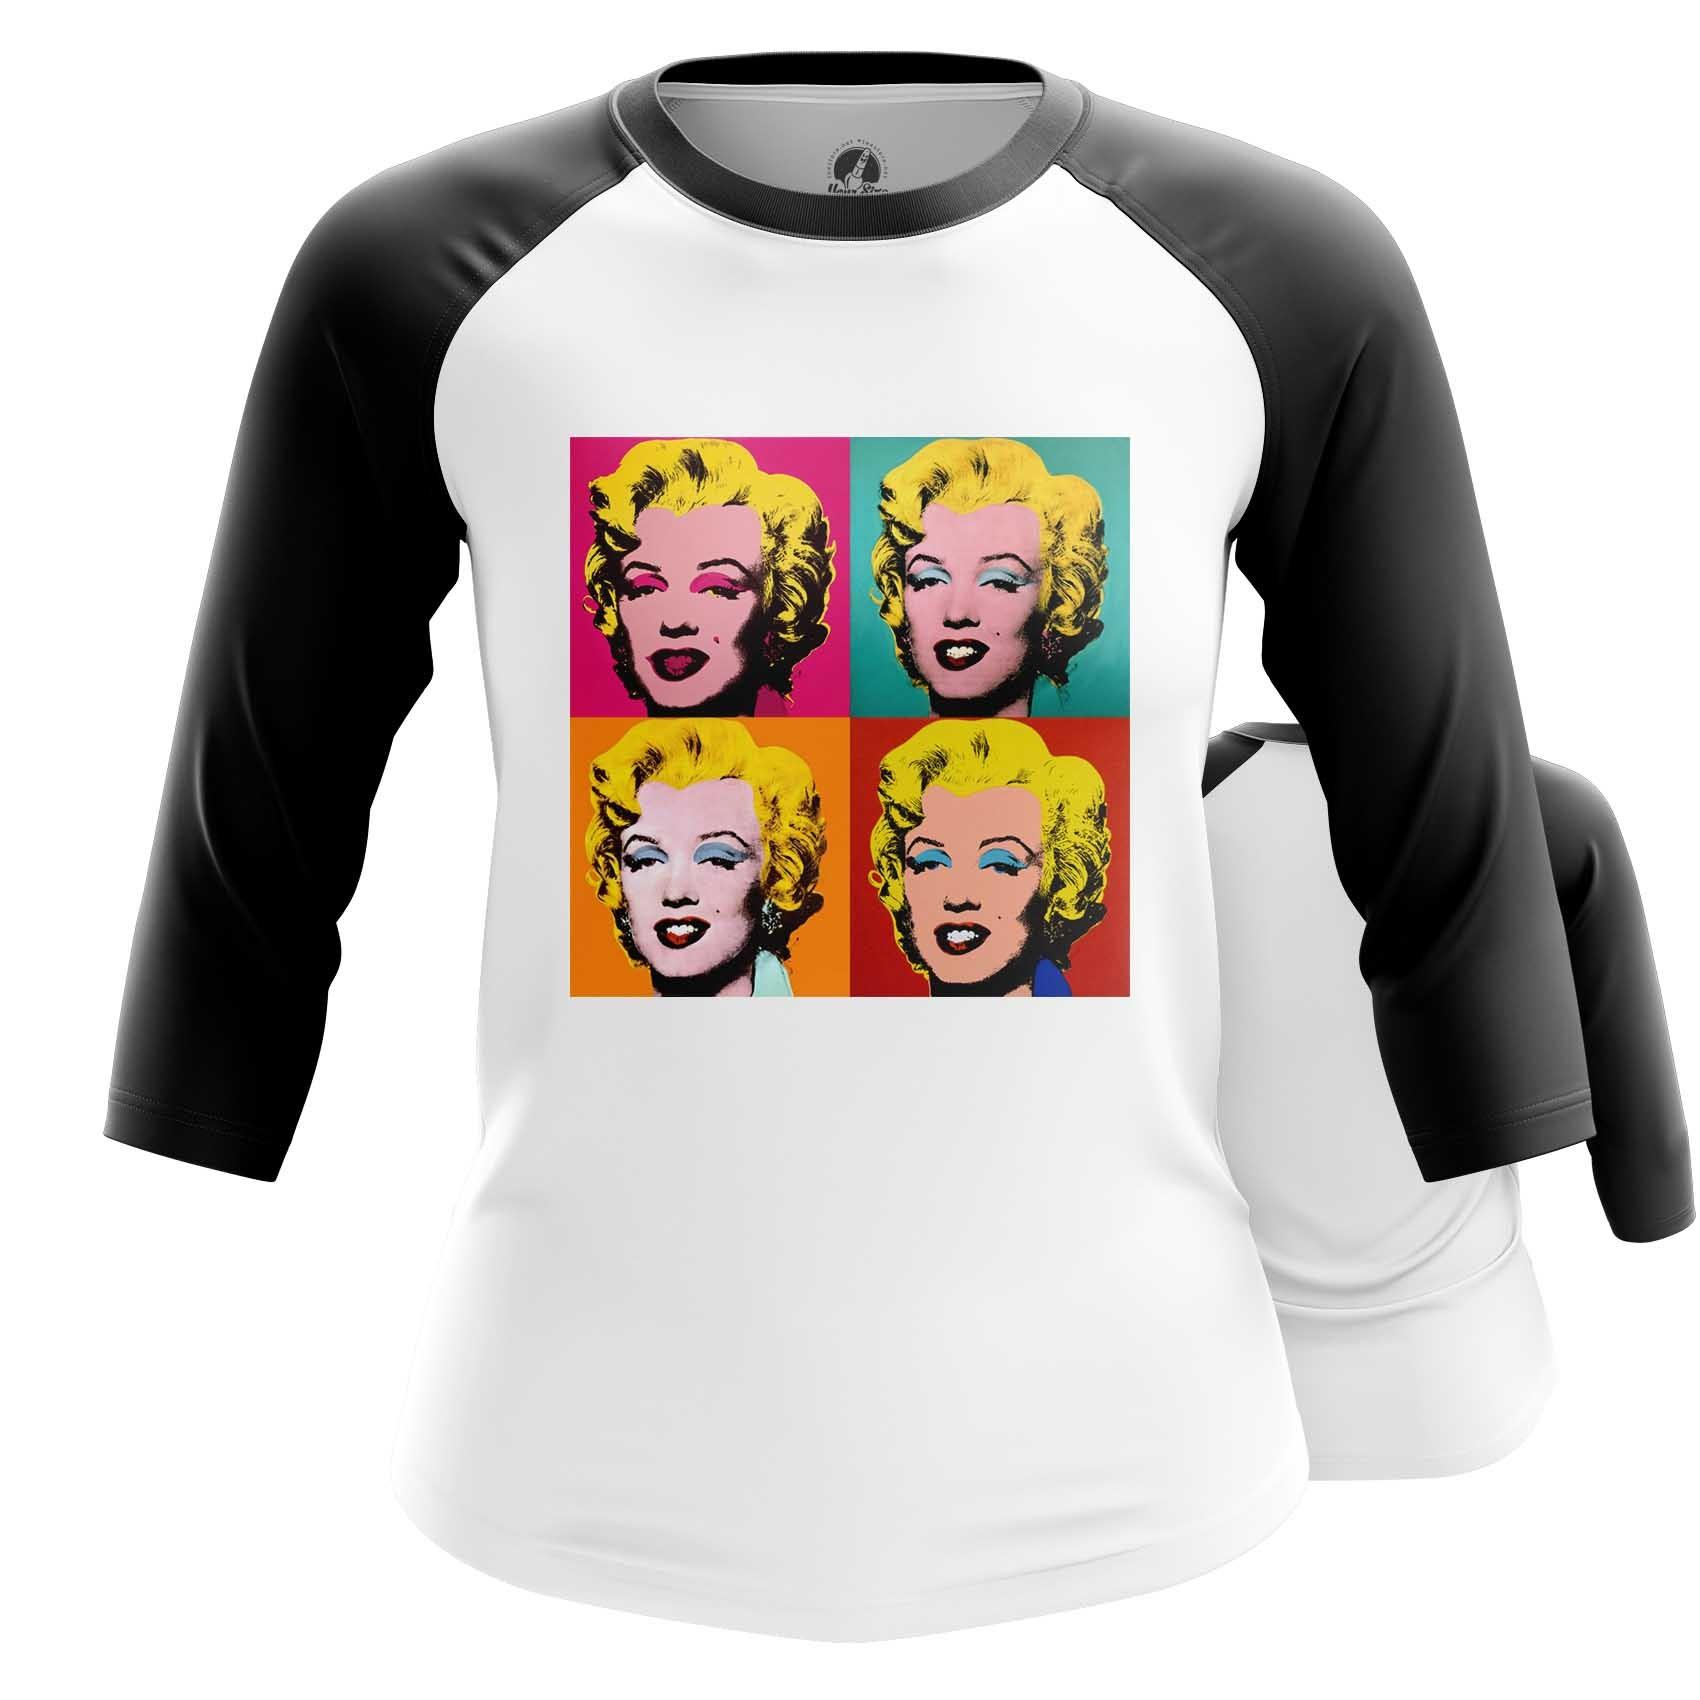 Merchandise Women'S T-Shirt Marilyn Monroe Andy Warhol Top